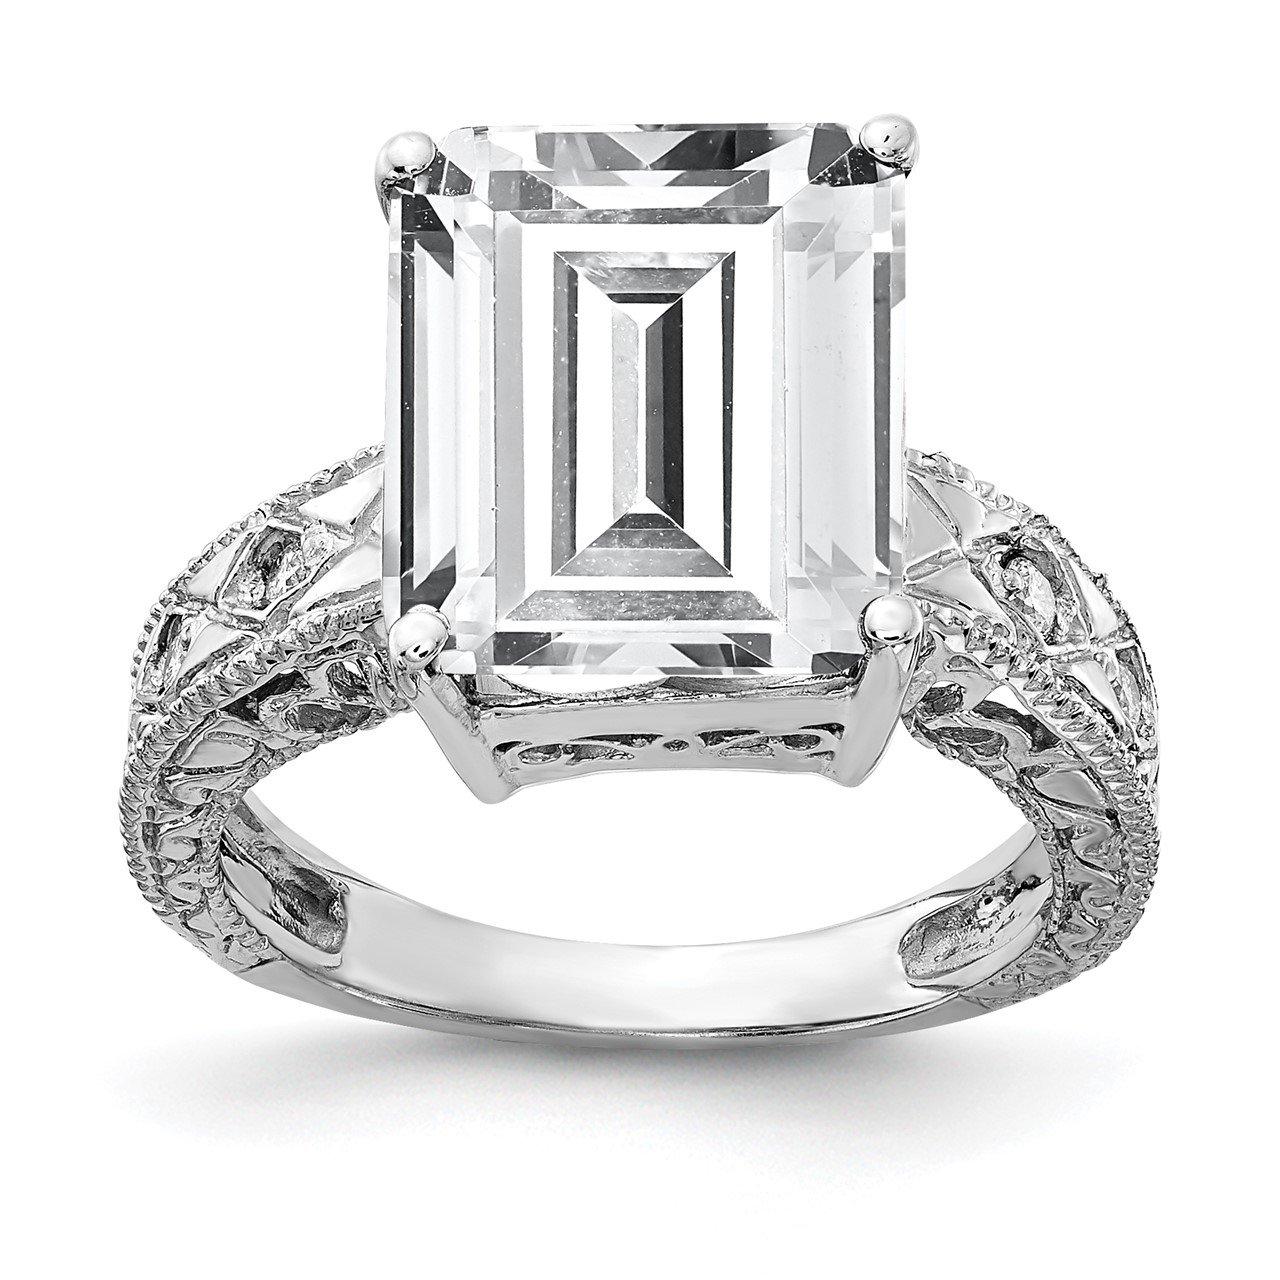 14k White Gold 12x10mm Emerald Cut Cubic Zirconia A Diamond Ring